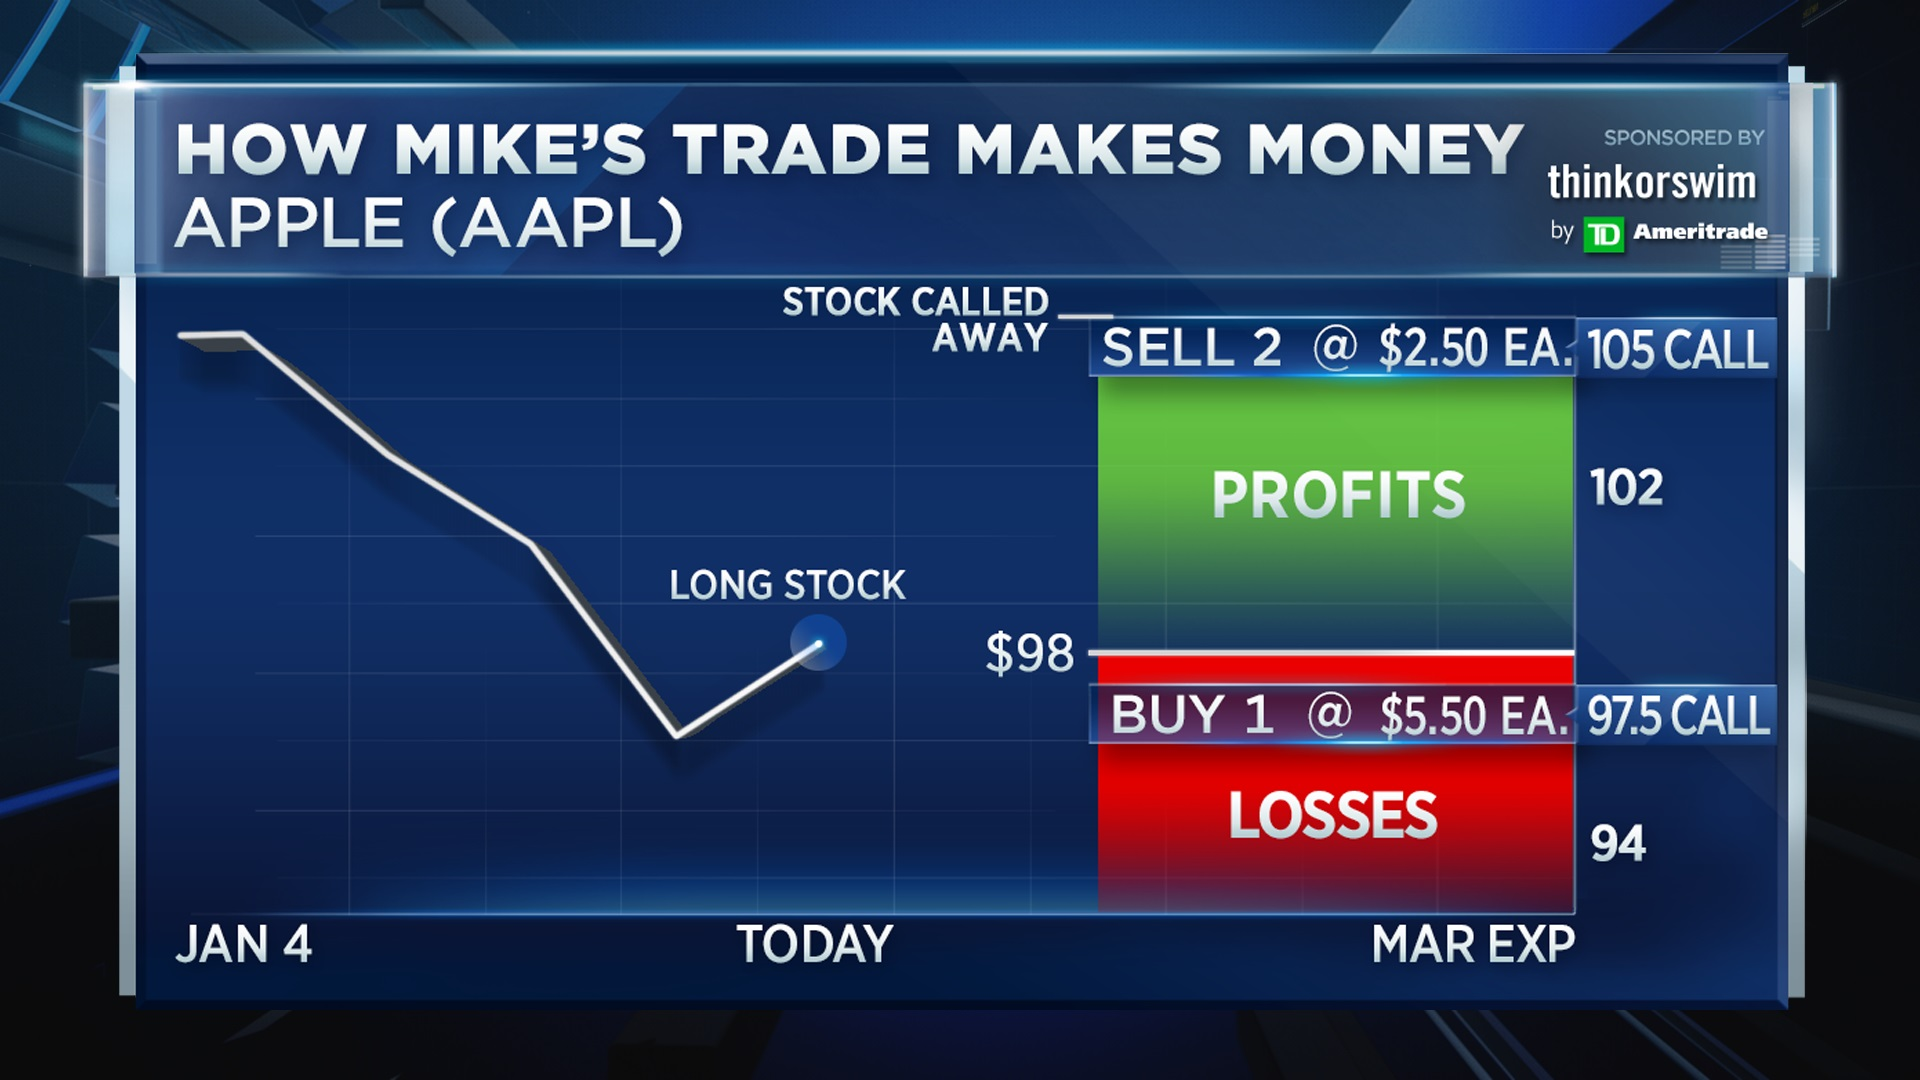 Trade options make money khouw